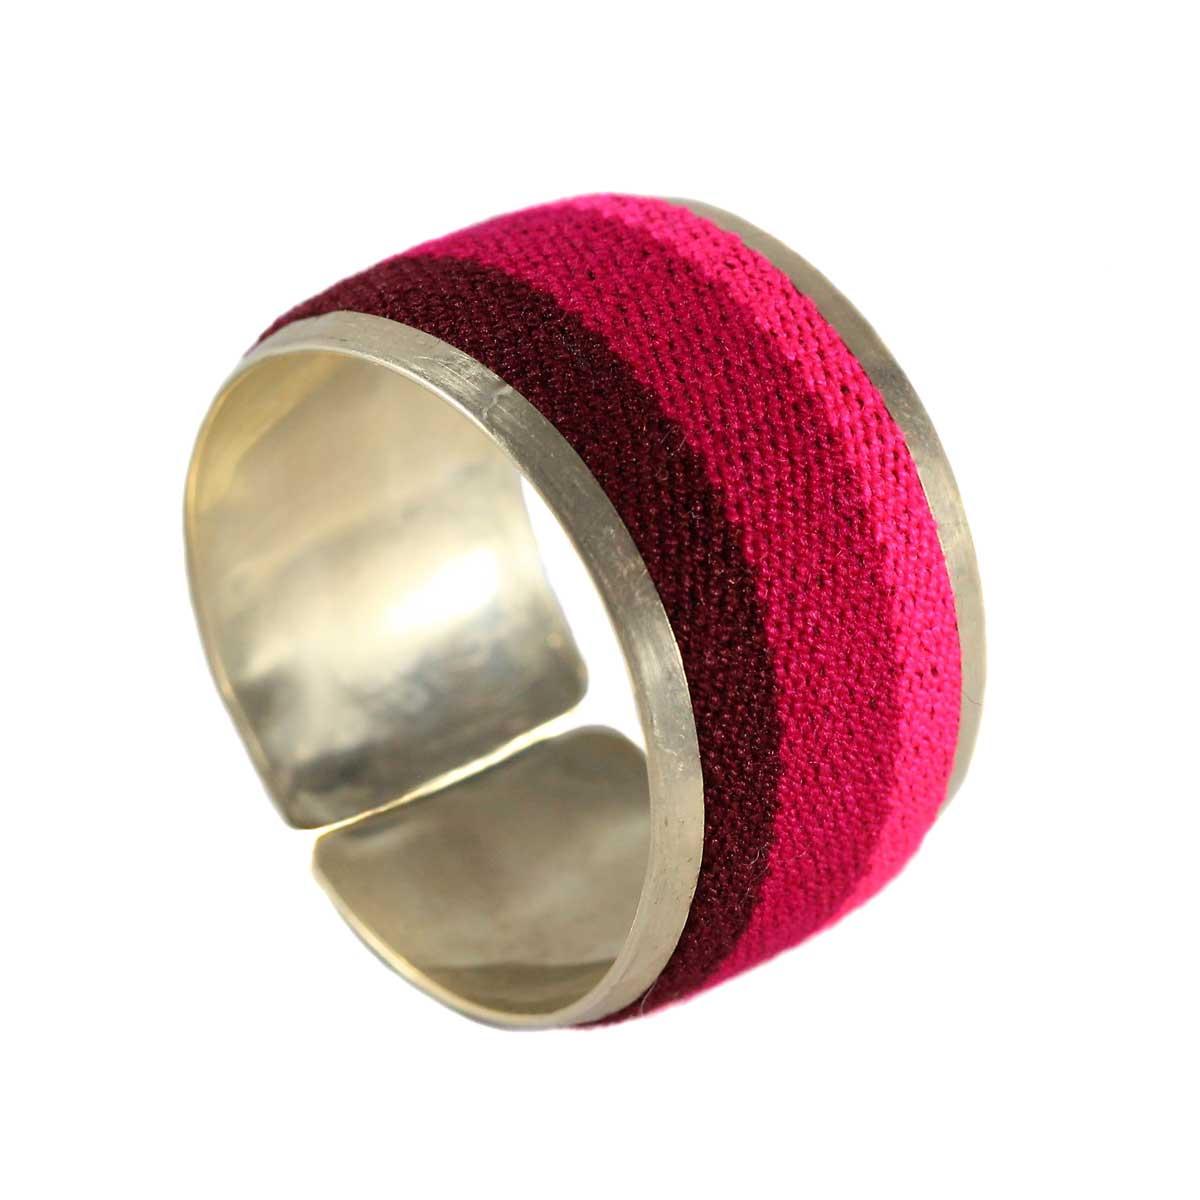 Inka-Products-Bracelet Tissu Traditionnel Péruvien-Nuances de Fuchsia-2